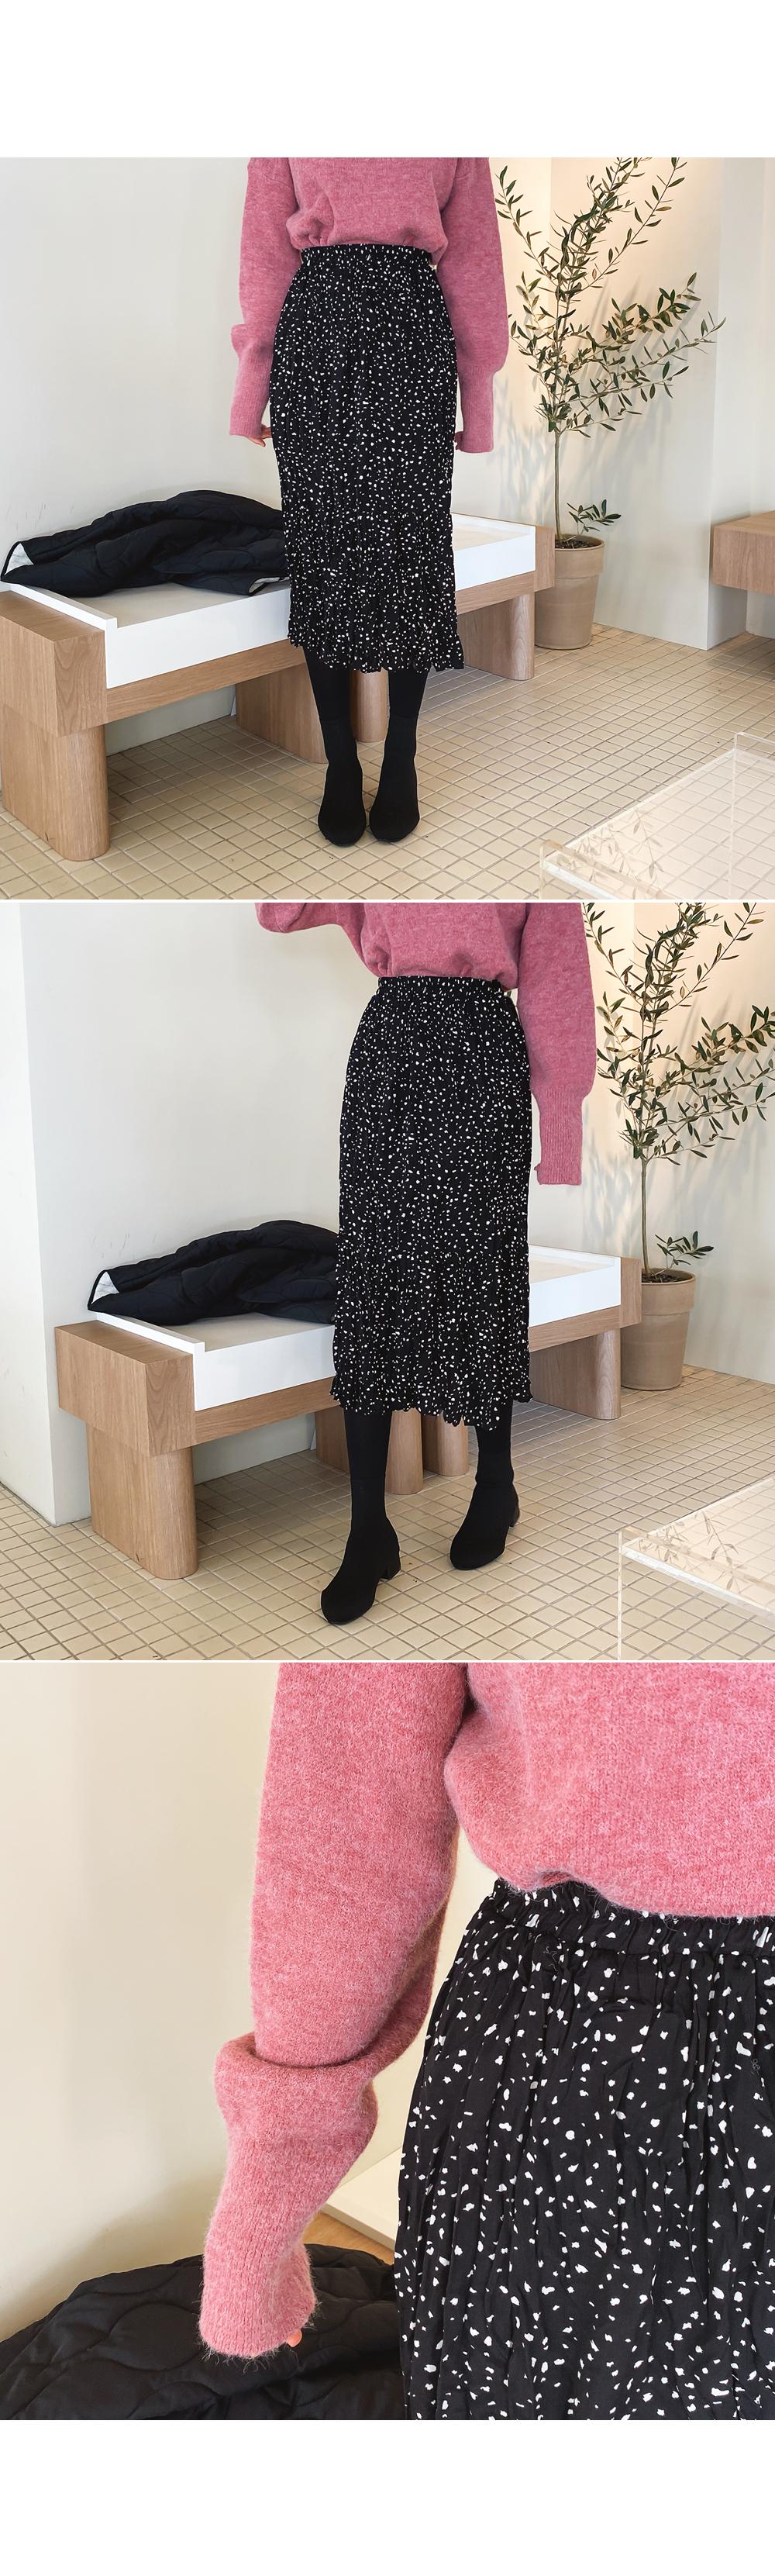 Gentle banding lining skirt